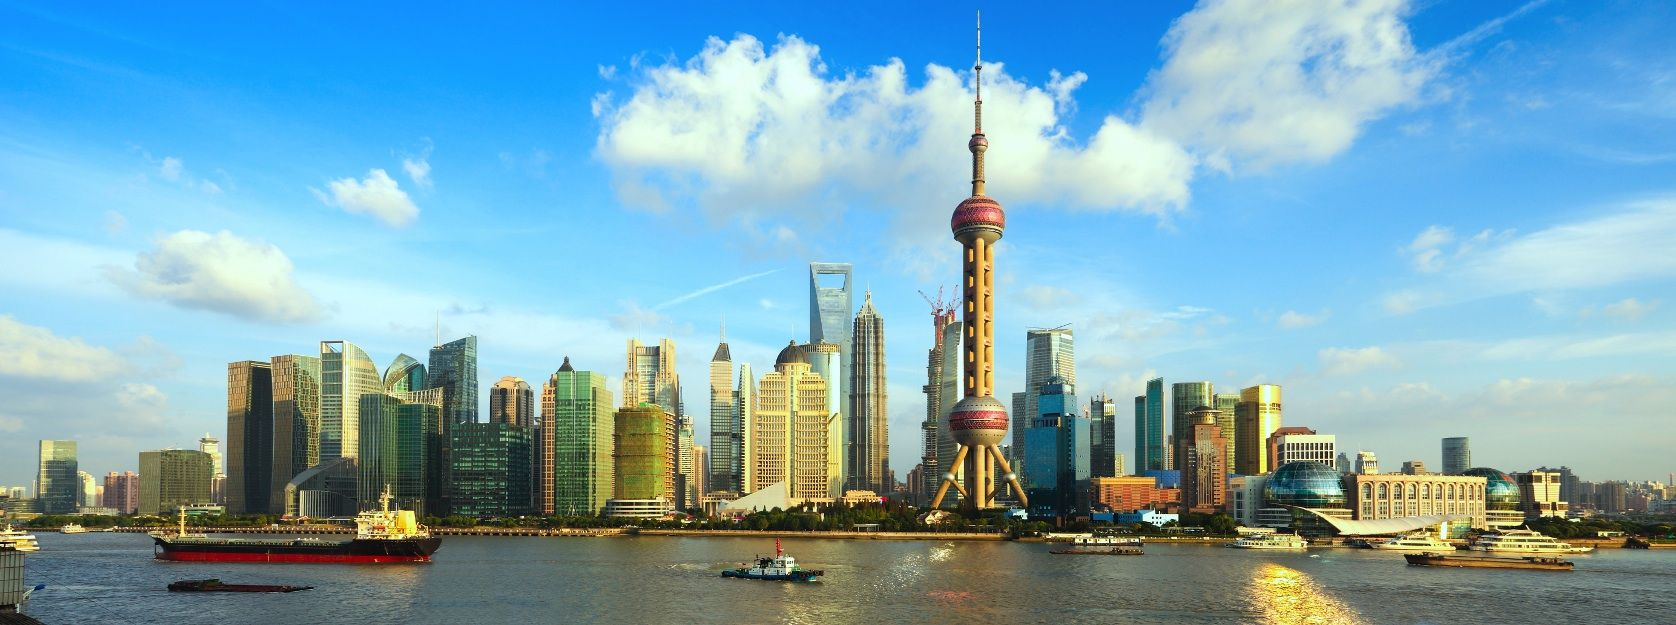 china shanghai - Google 검색